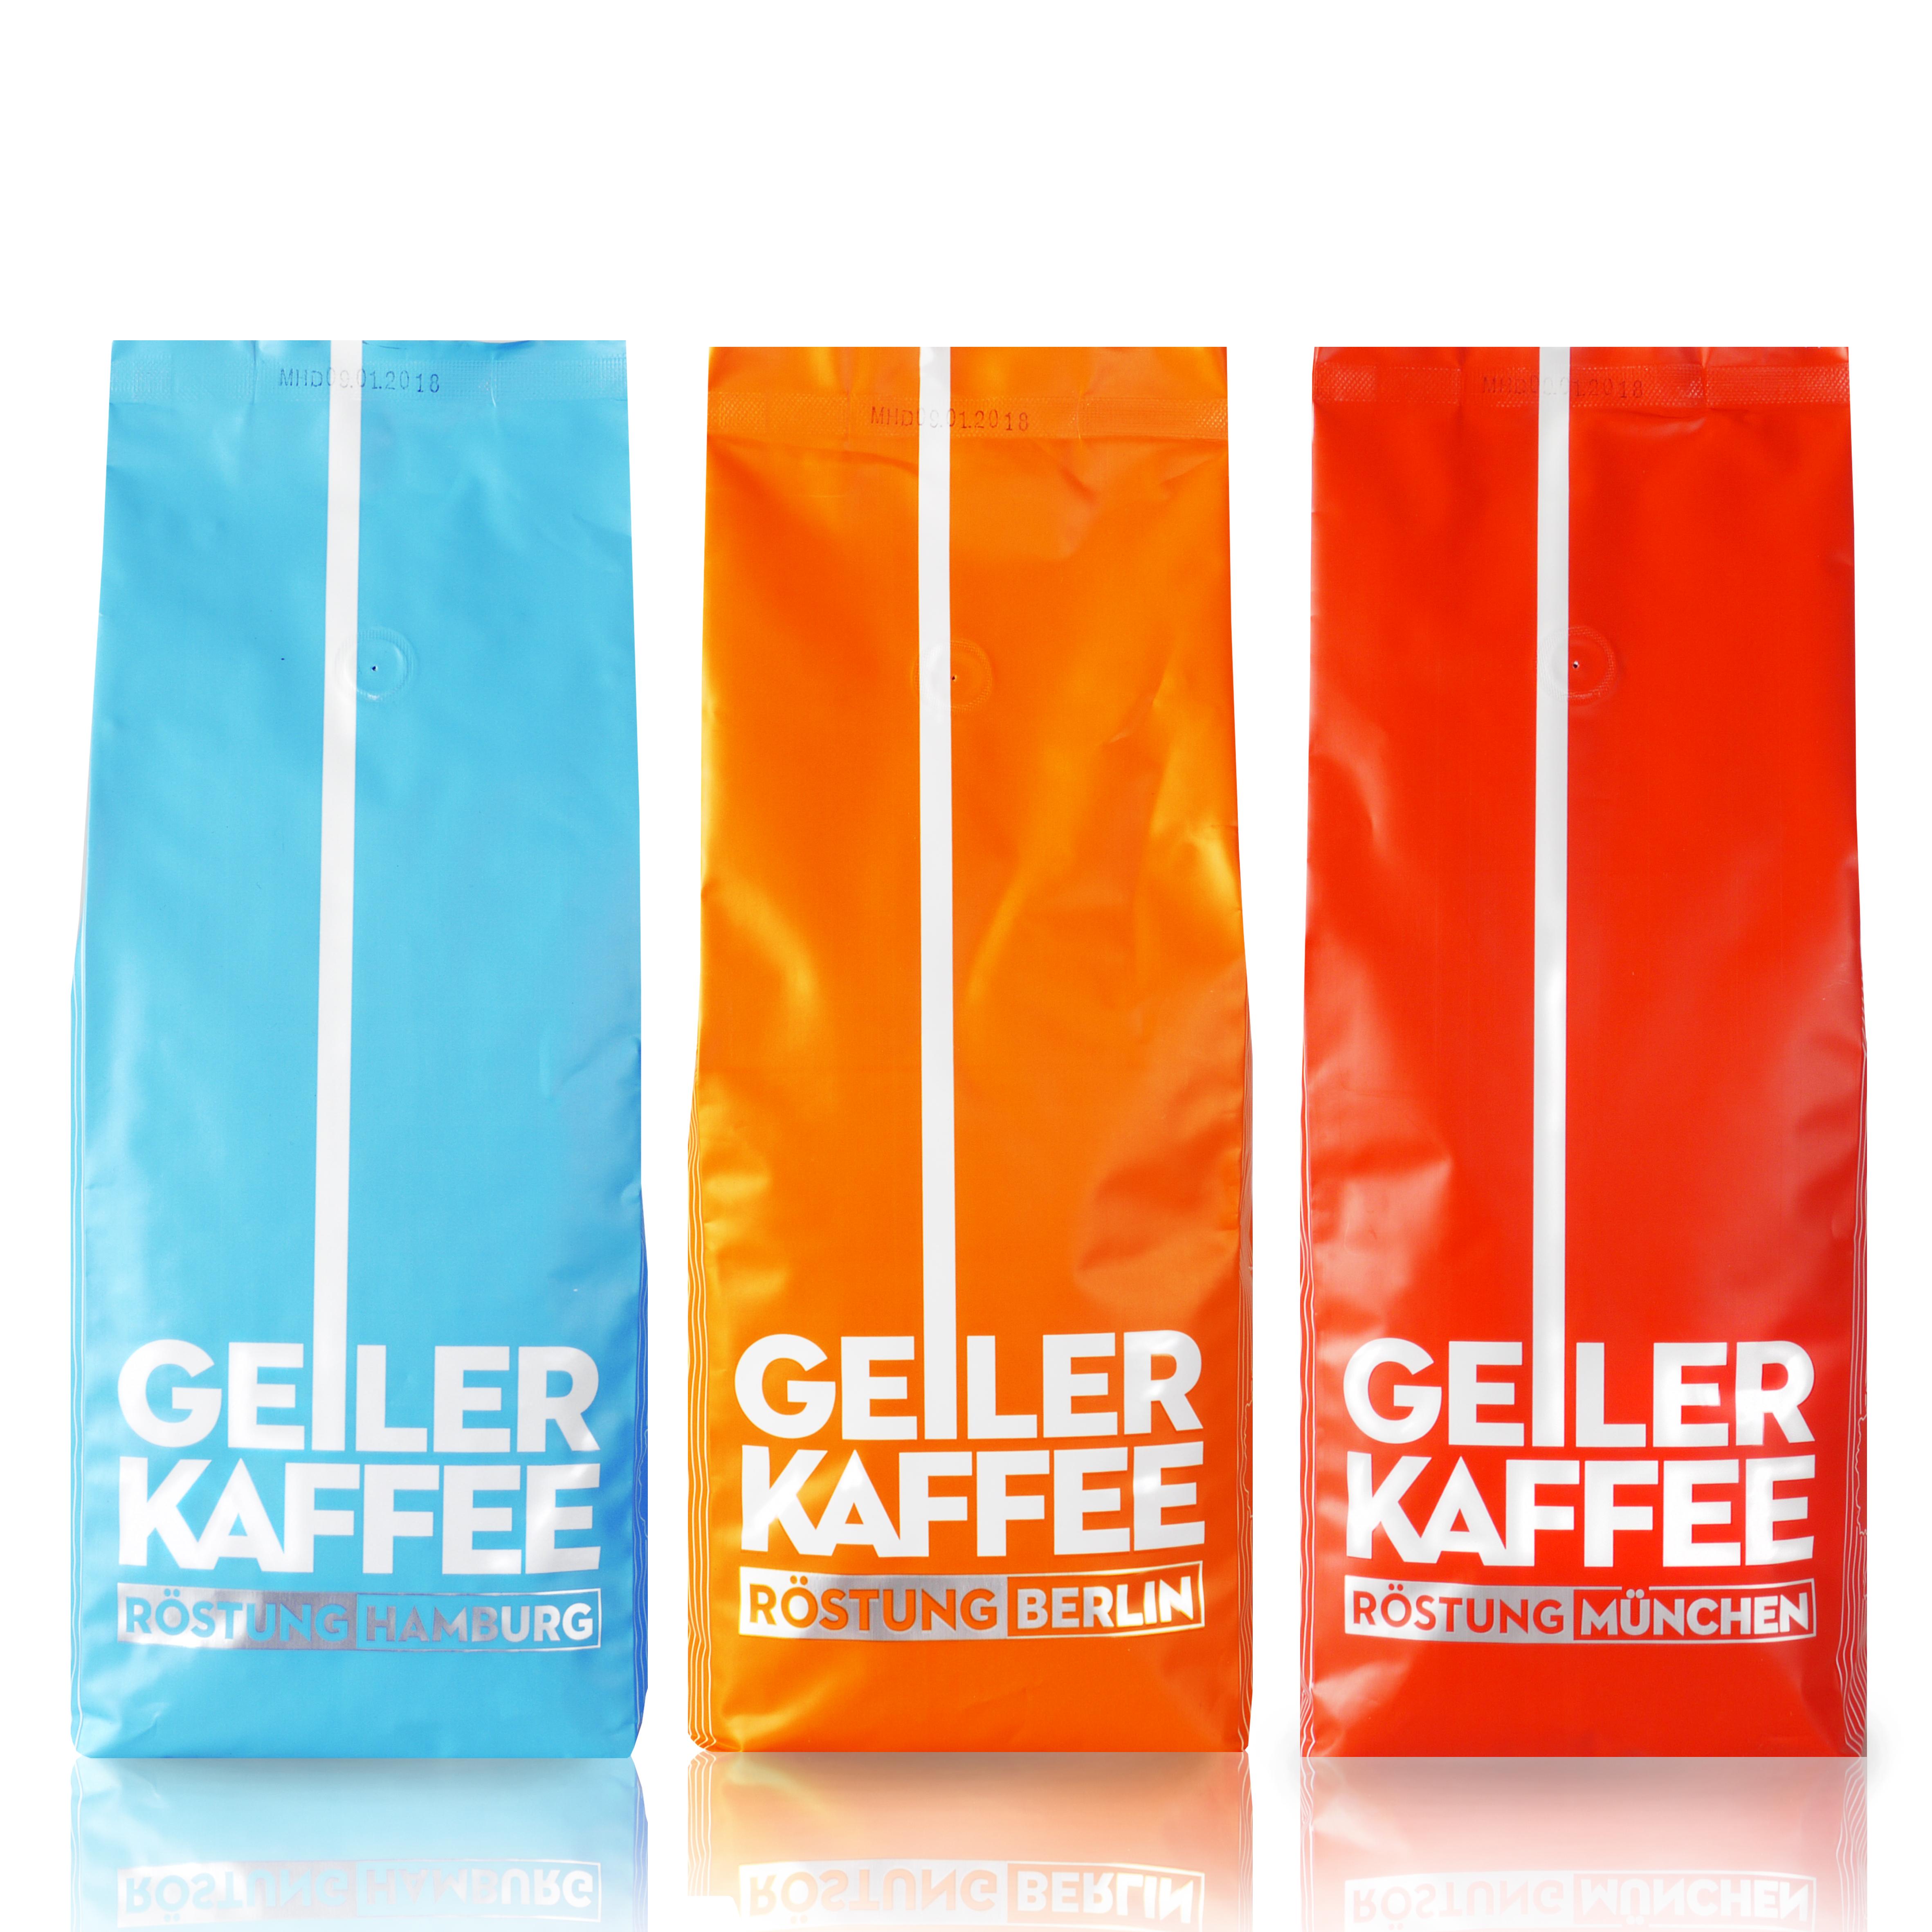 Geiler-Kaffee_Produktgruppe359958f2f28994